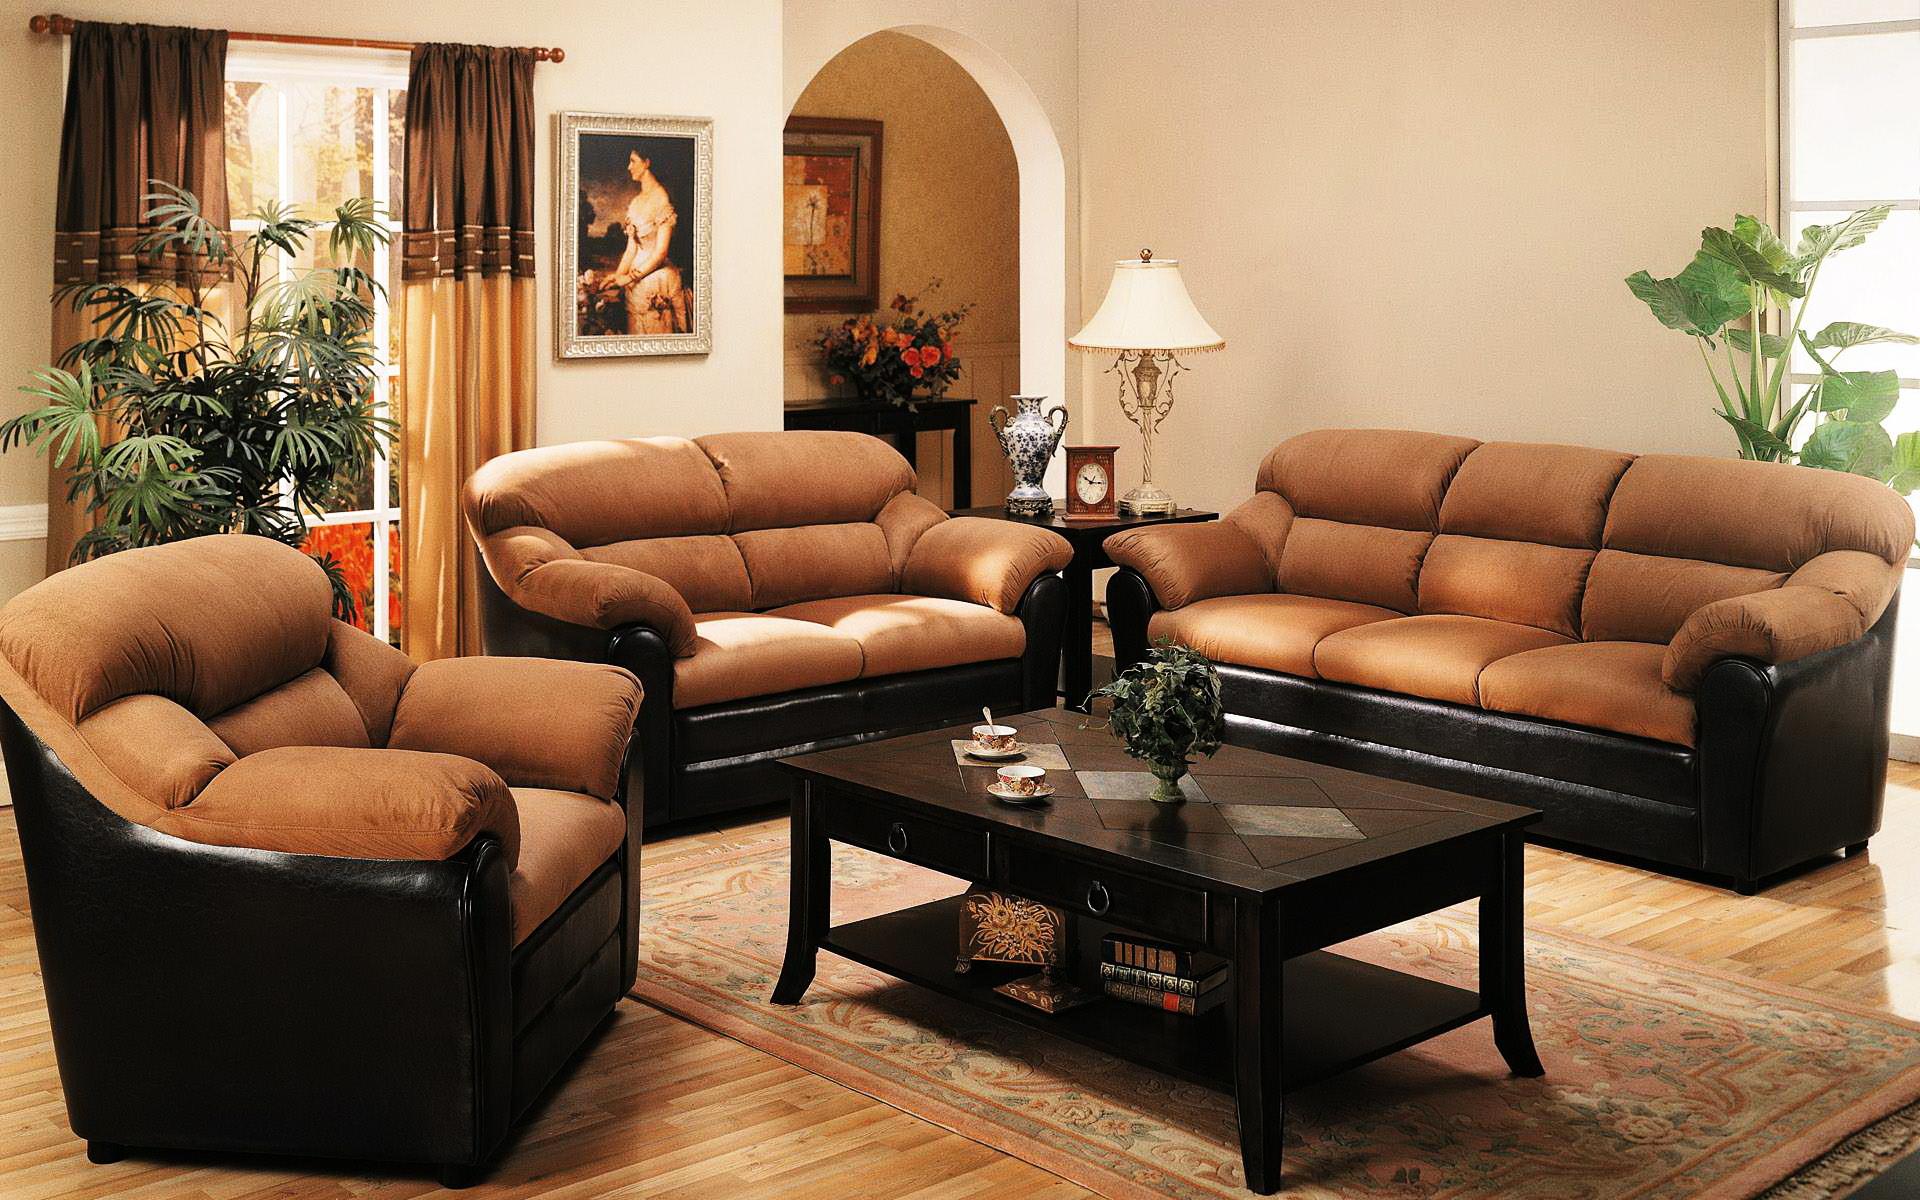 High Resolution Wallpaper   Furniture 1920x1200 px